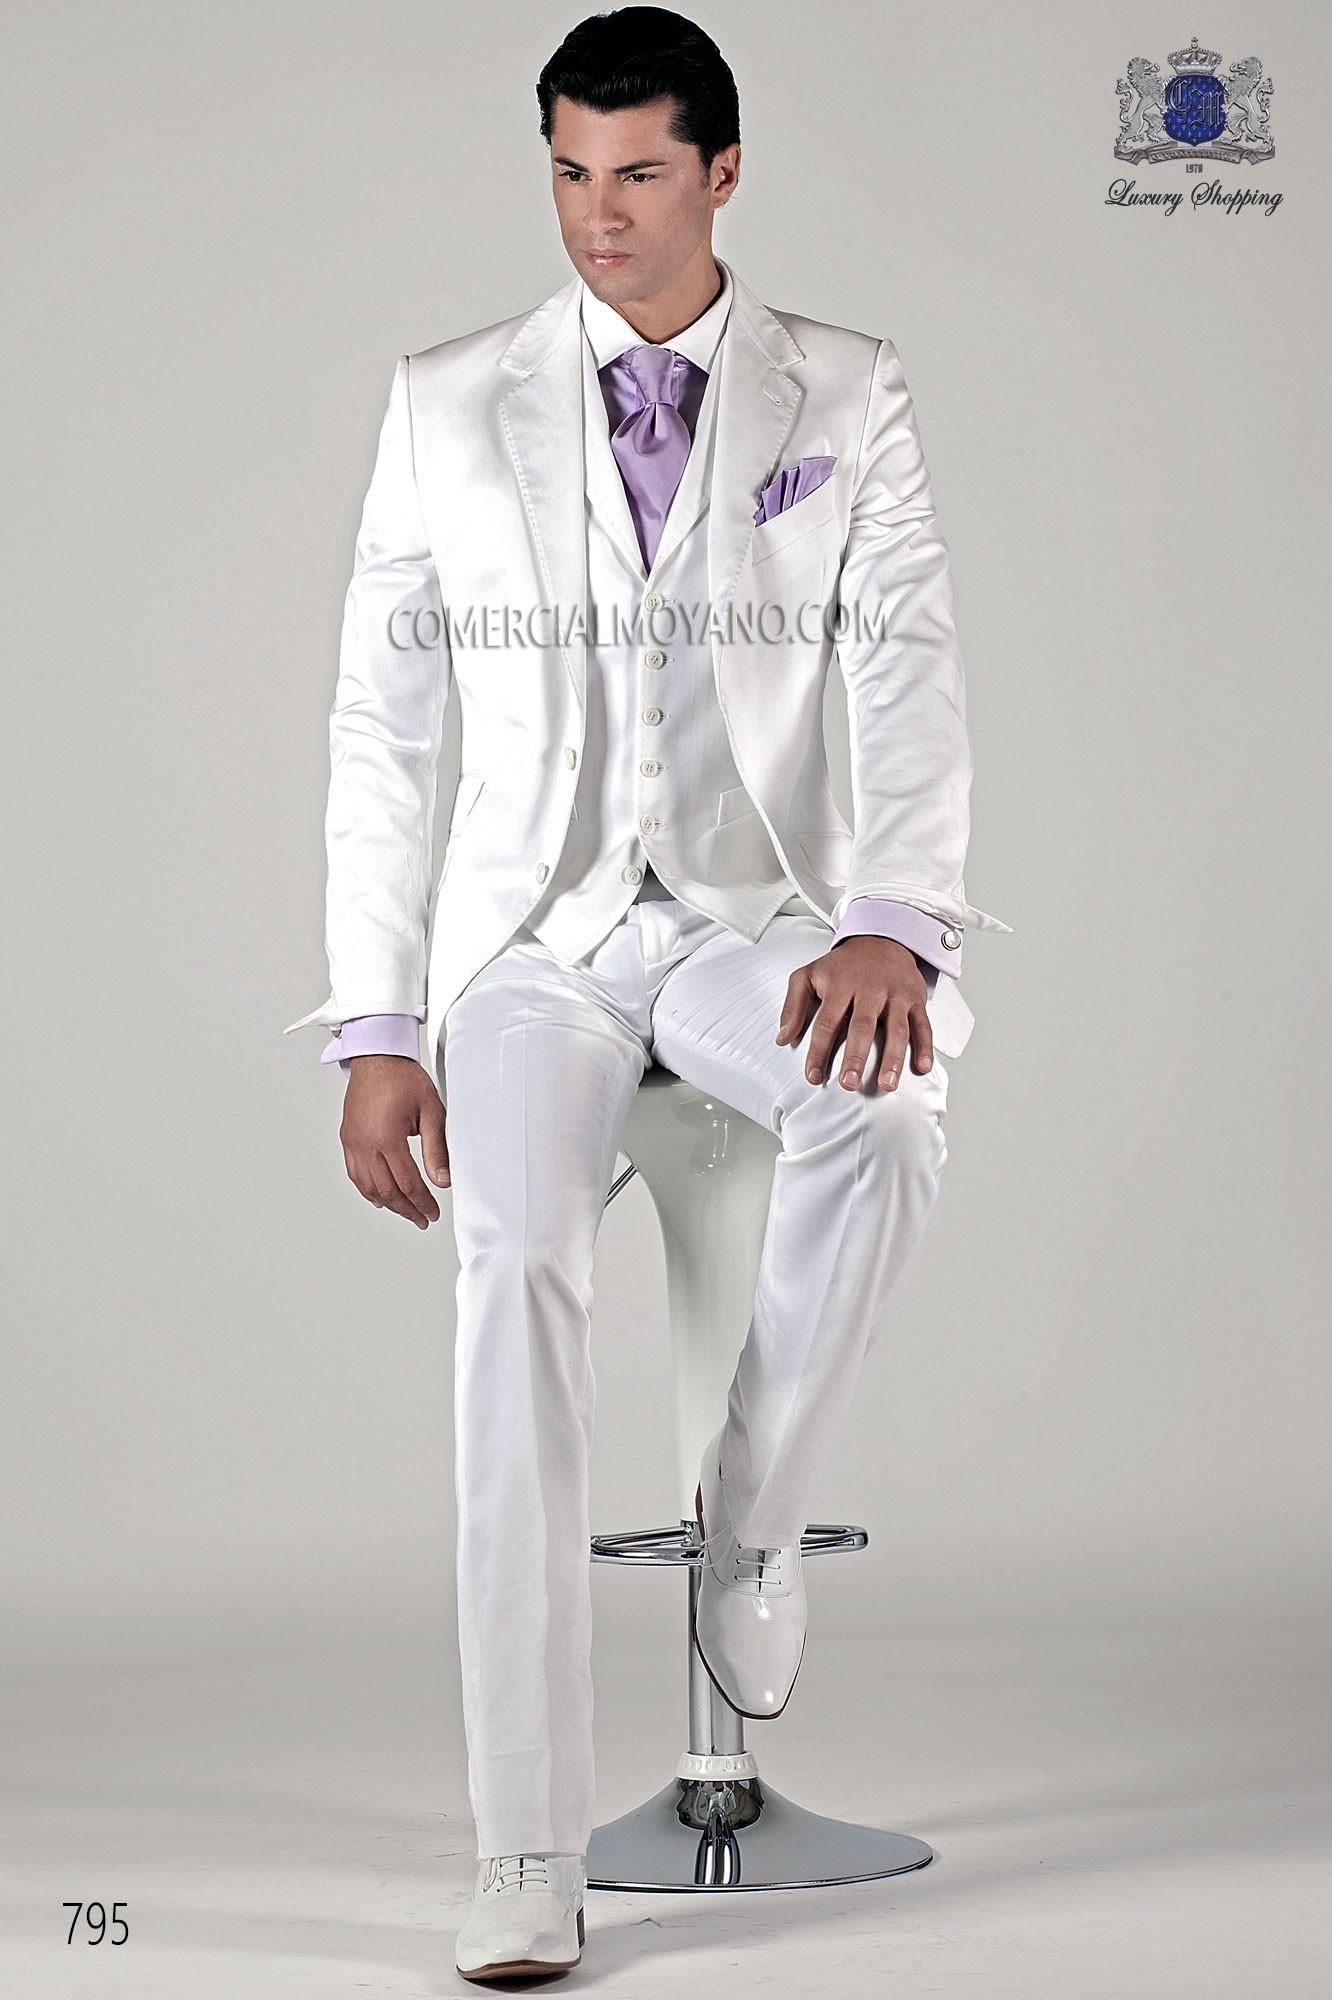 Hipster white men wedding suit model 795 Ottavio Nuccio Gala